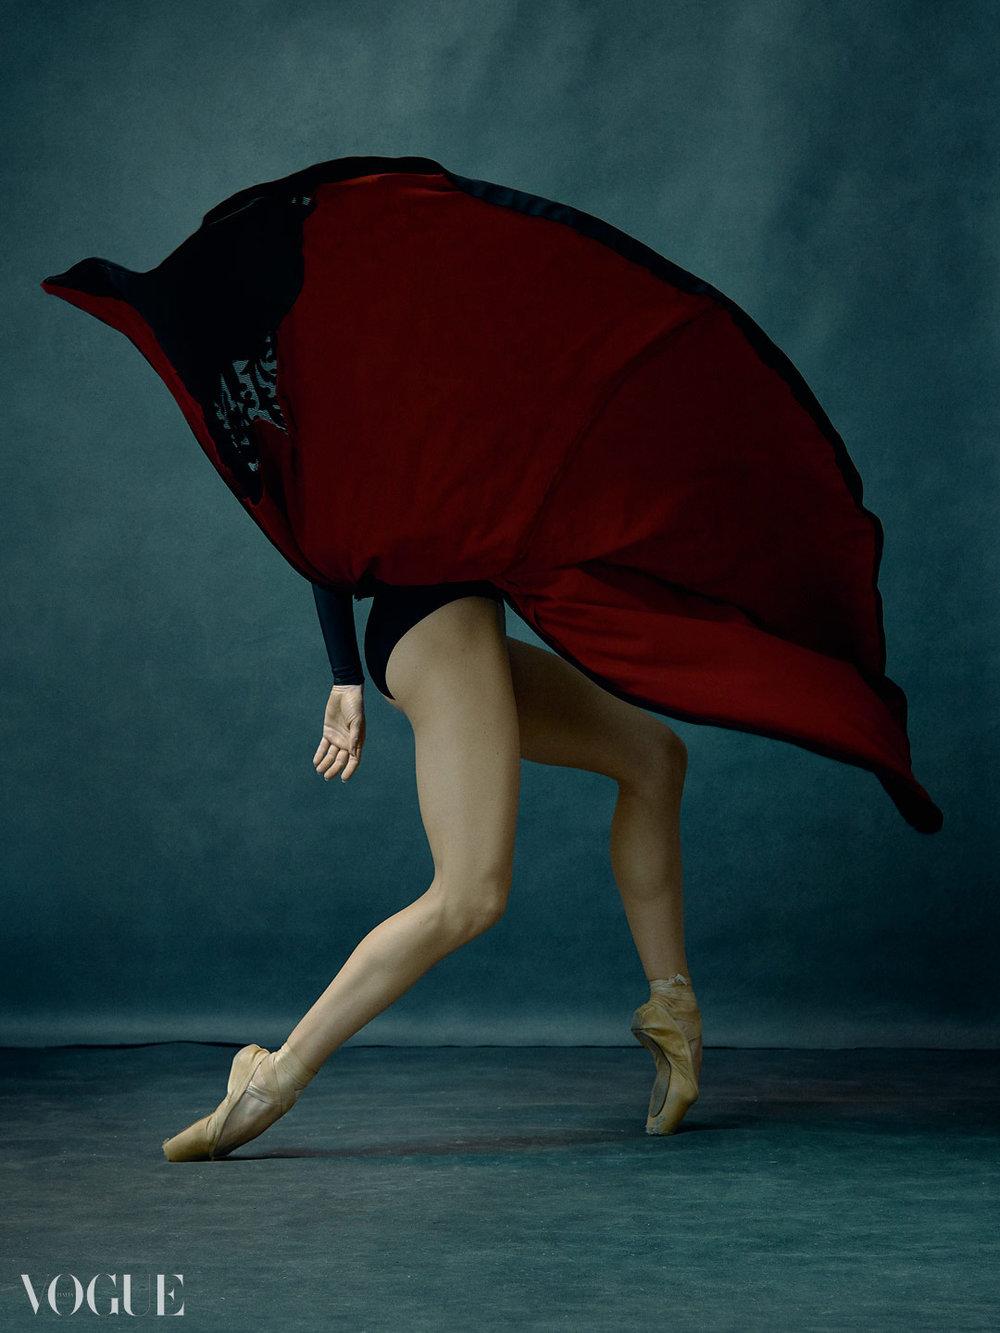 Montreal_Dance_Photographer-30375678.jpg